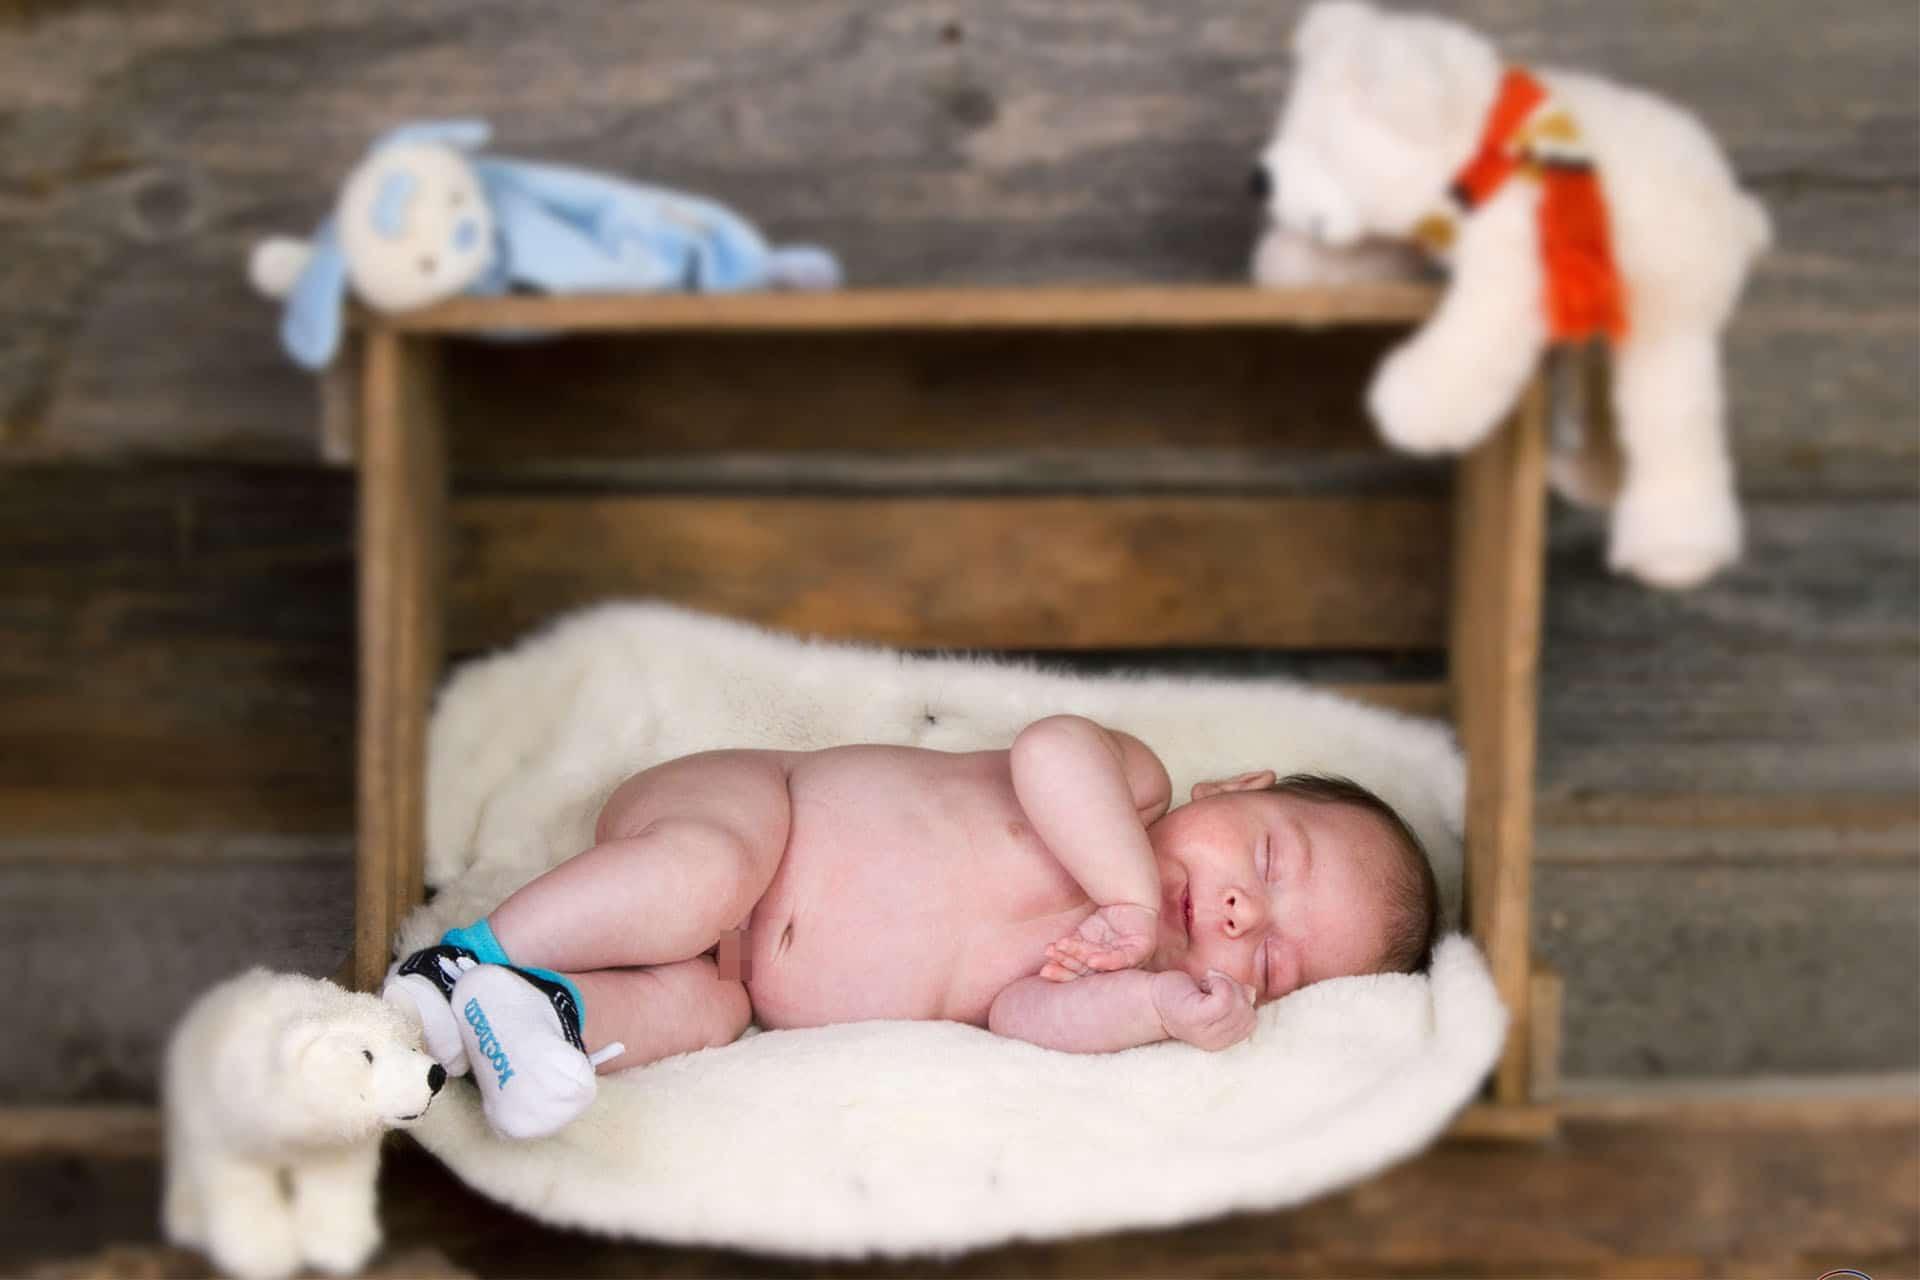 Babyfotografie - Babyfotograf - Babyshooting Murnau - Babyfotos - Foto Stoess